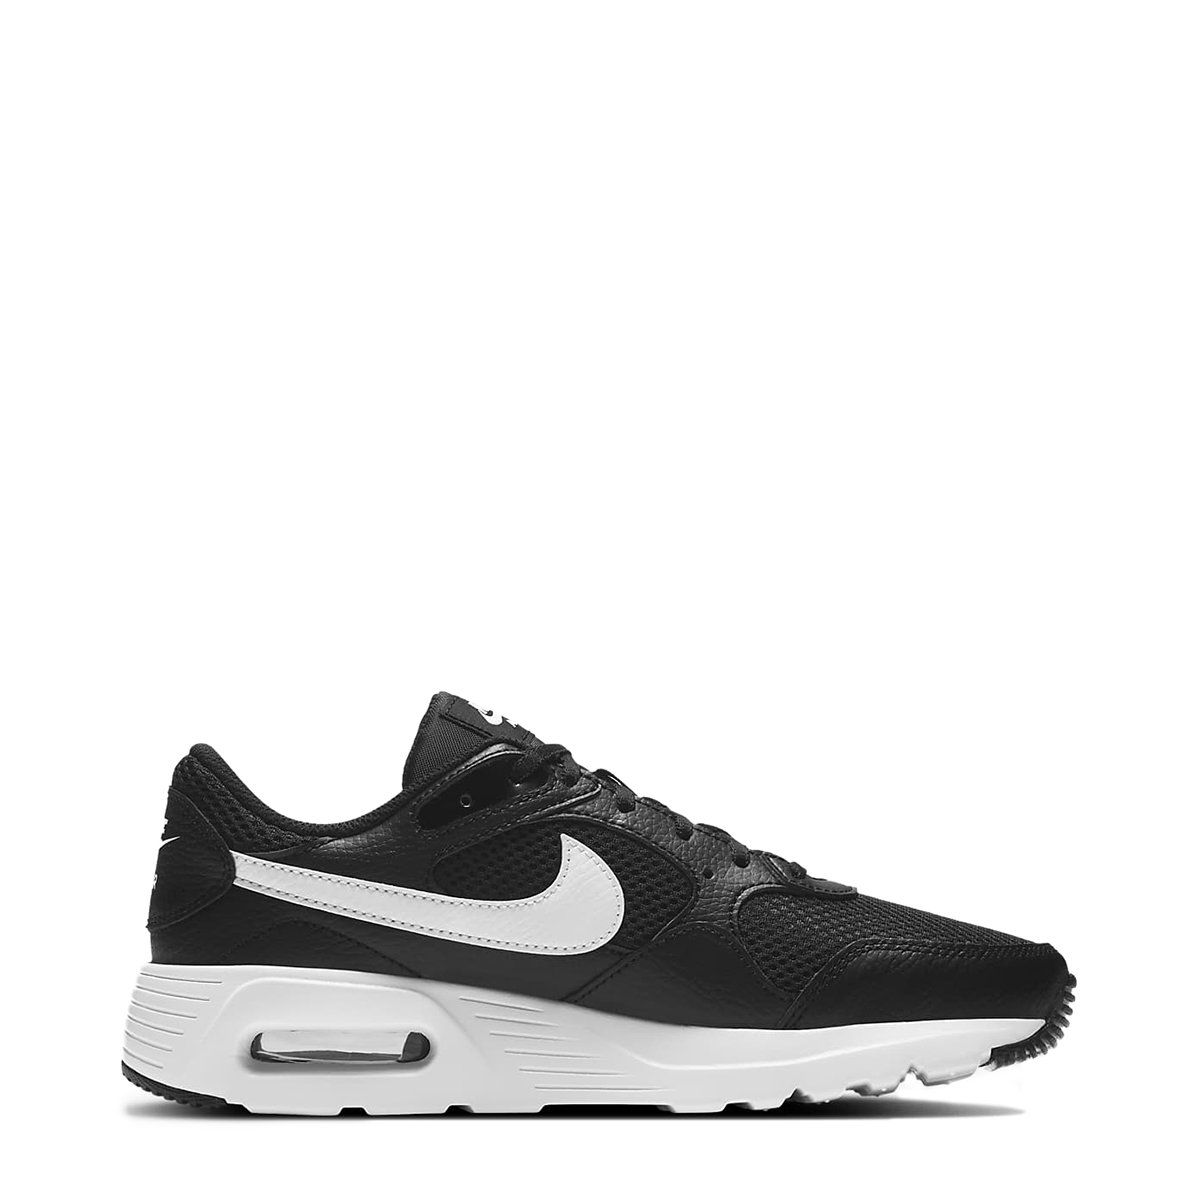 Nike Women's AirMaxSC White 349821 - black US 5.5